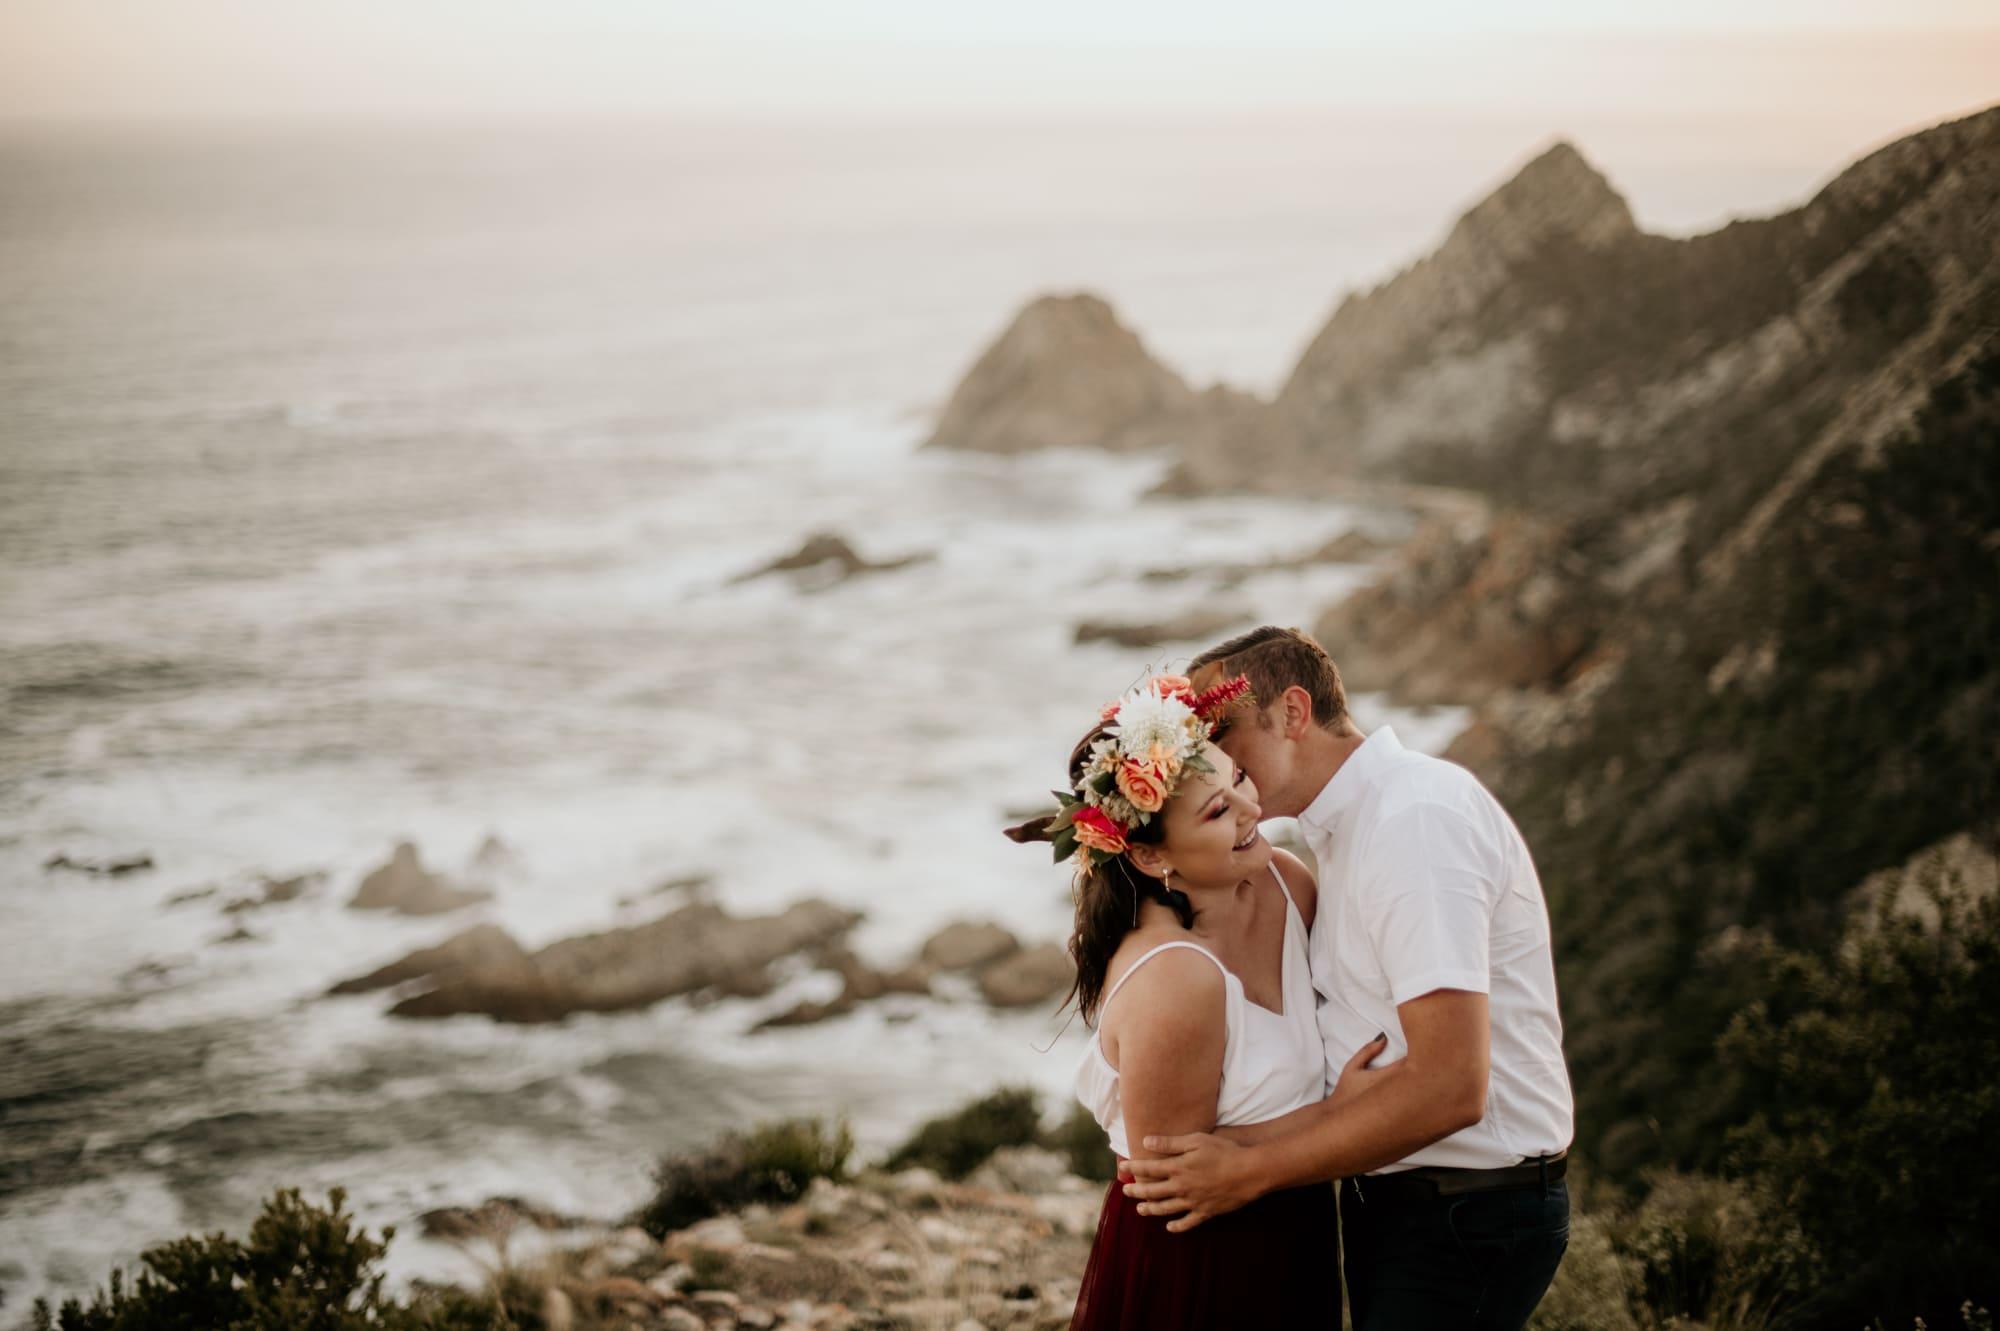 jesann-freddie-kranshoek-engagement-June-Richards-Photography-Destination-Weddings-Elopements-Garden-Route-32